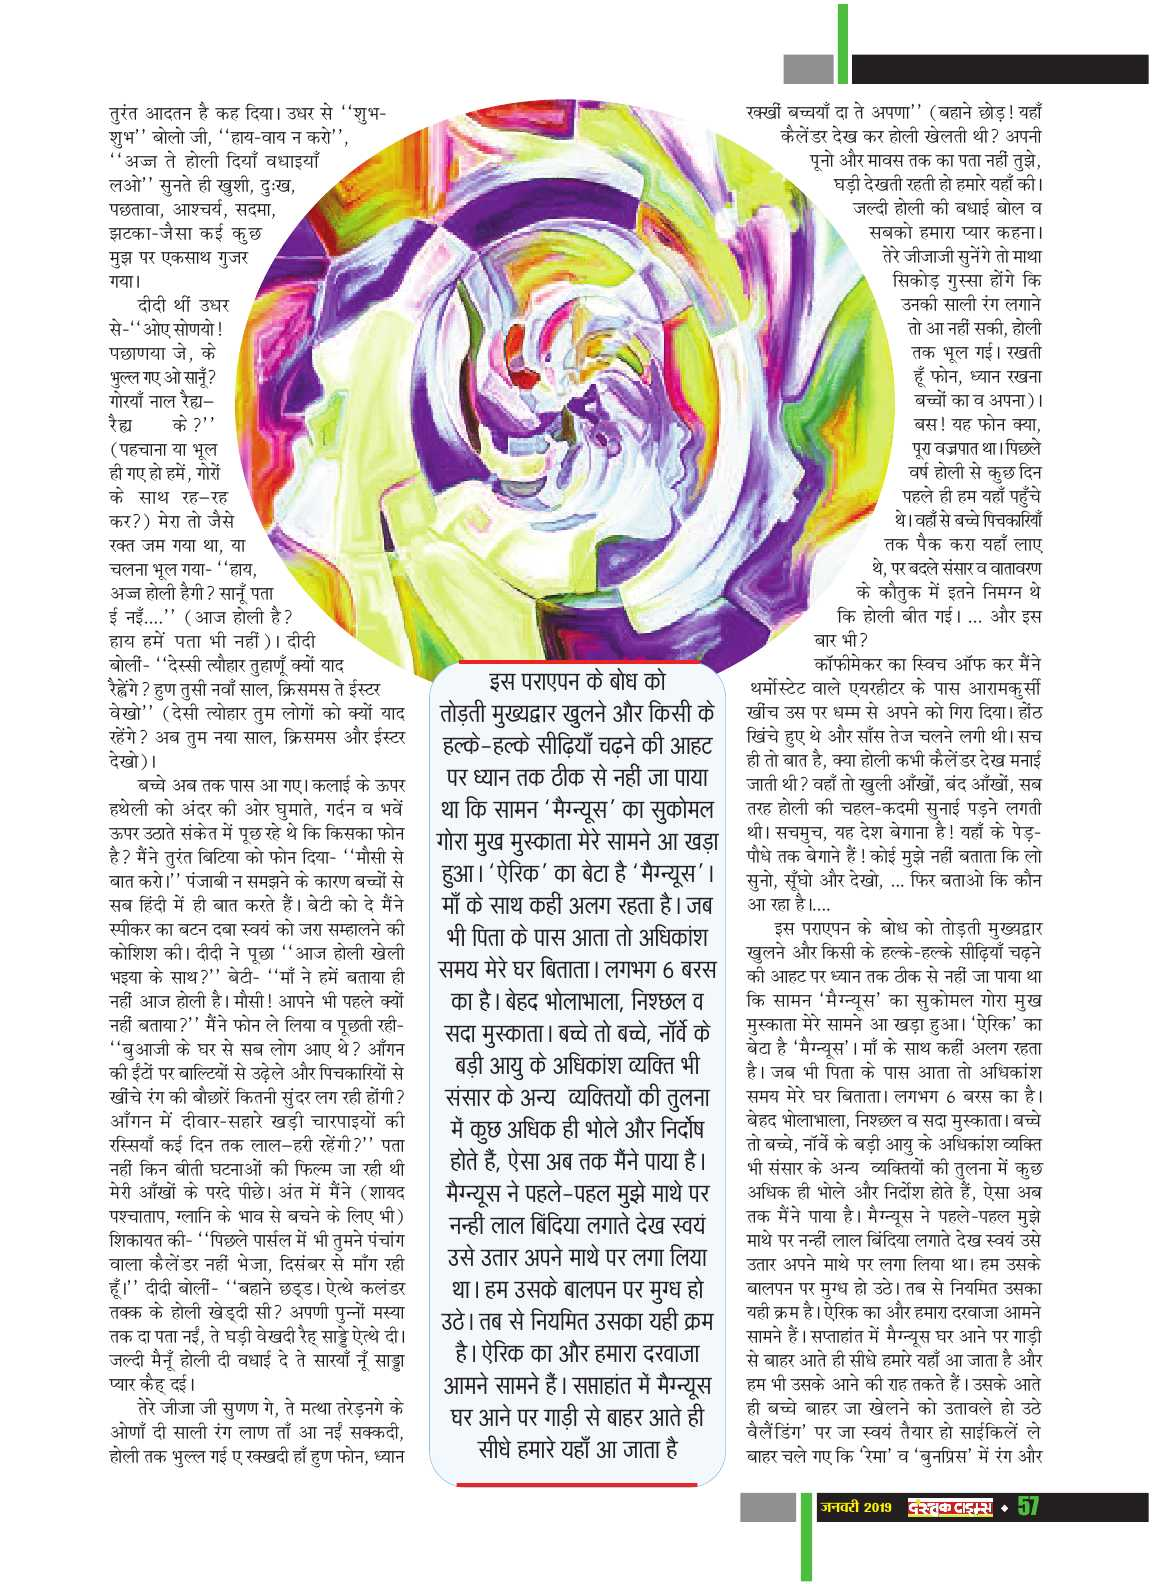 Dastak Times for E-Magazine 15 Jan 2019 new59